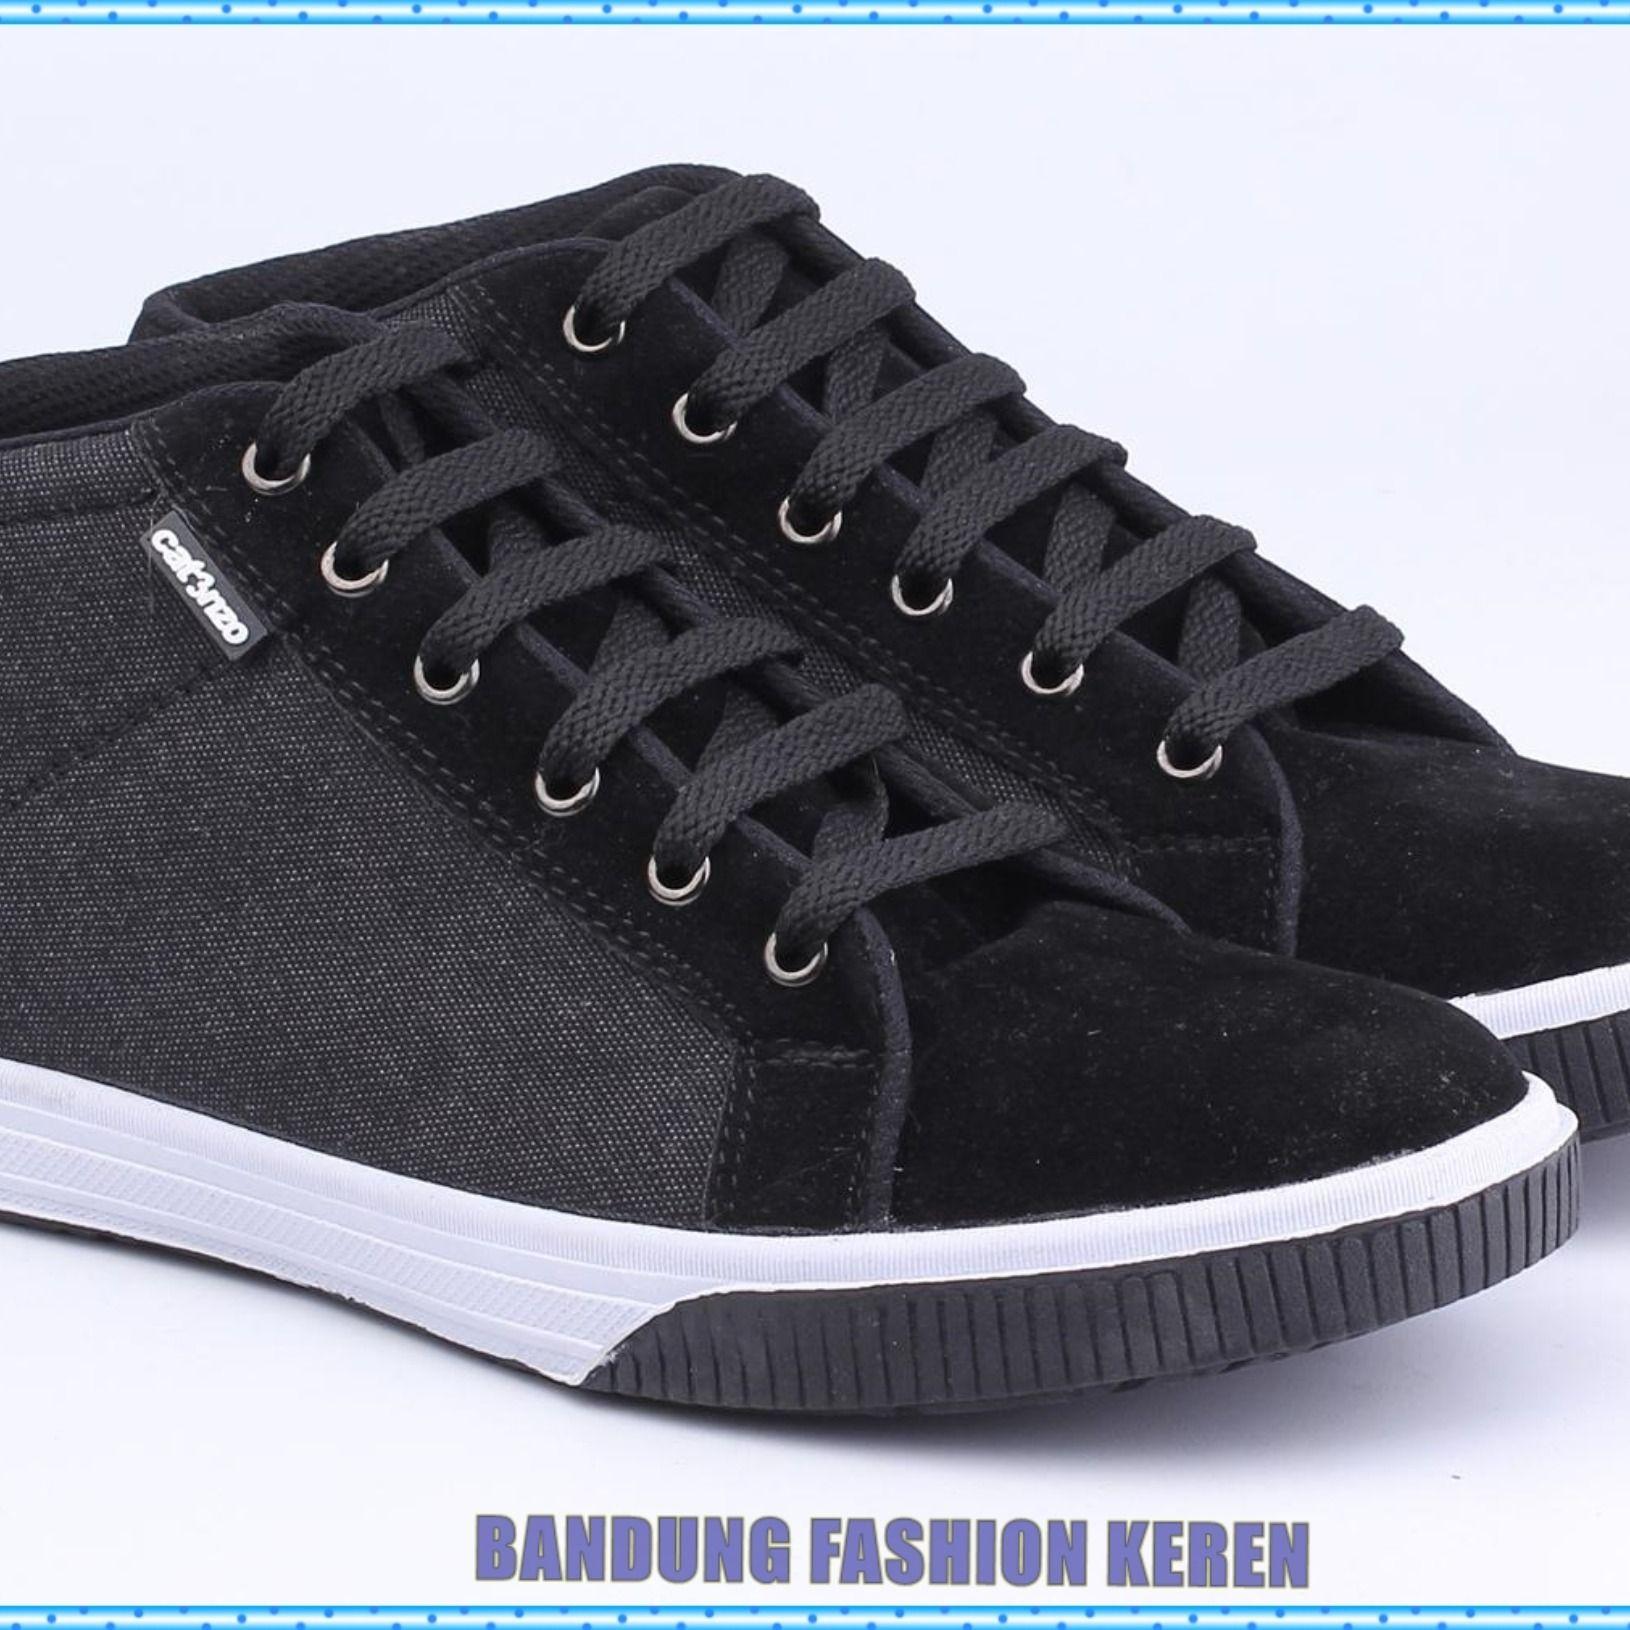 Sepatu Casual Pria Gn 012 Produk Fashion Handmade Terbaik 100